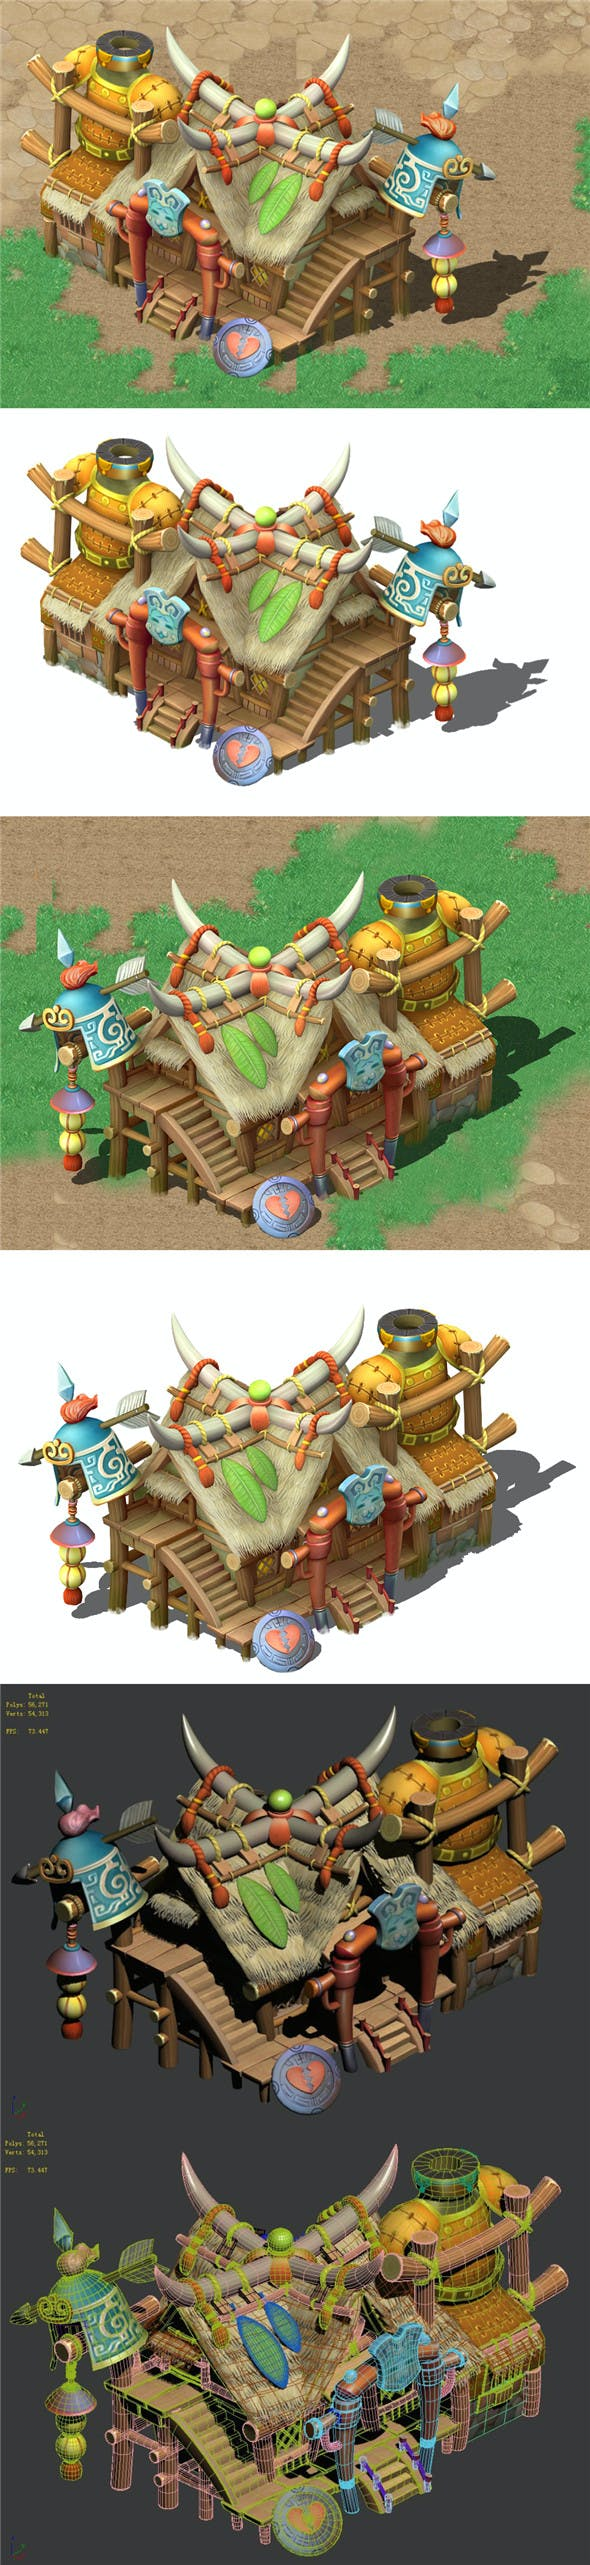 Cartoon World - Armory Shop 04 - 3DOcean Item for Sale